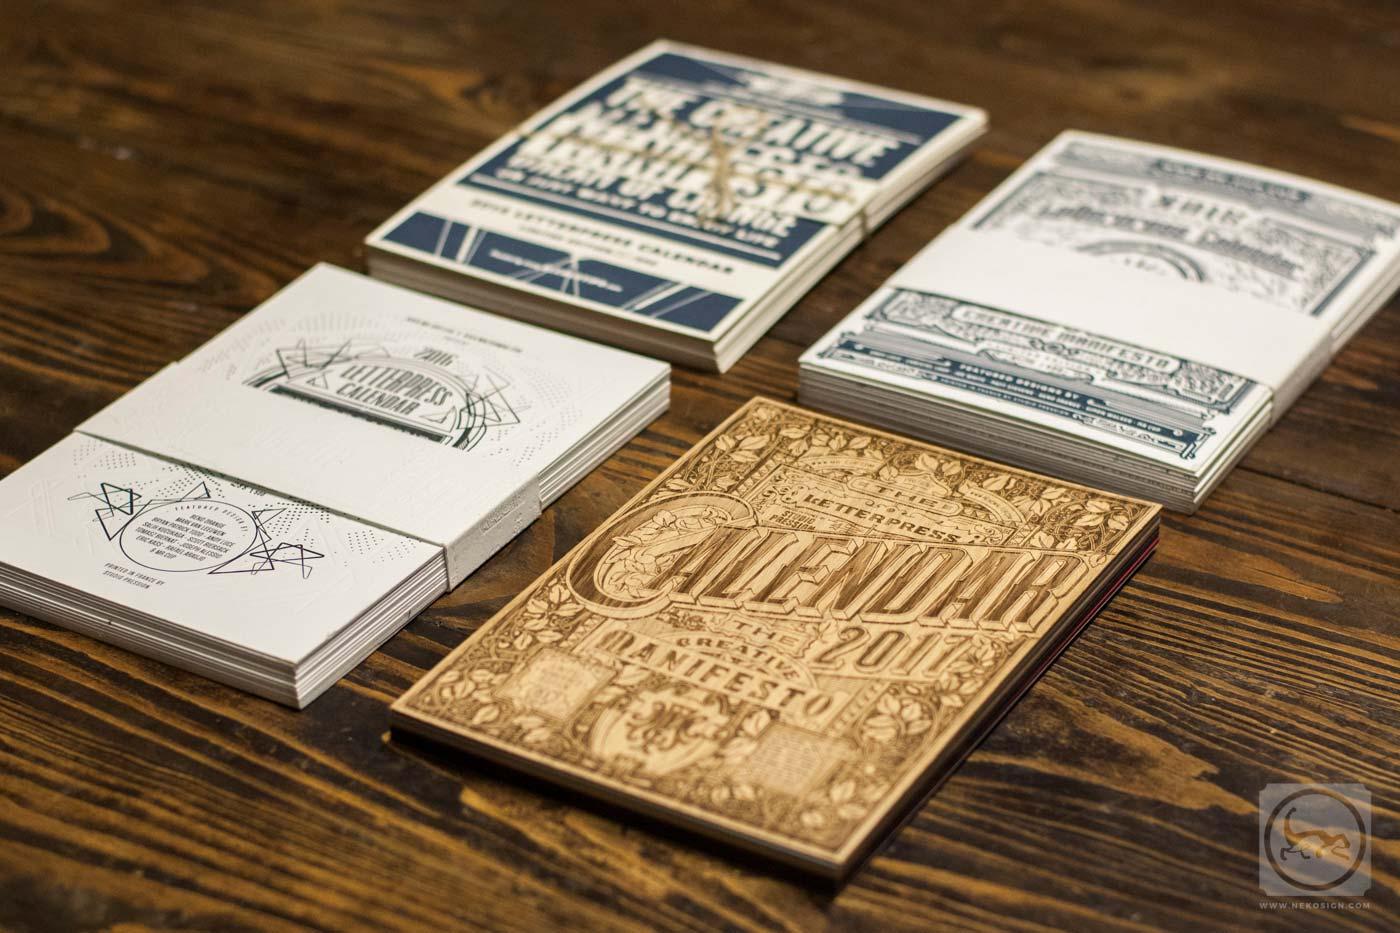 Calendrier letterpress 2014-2017